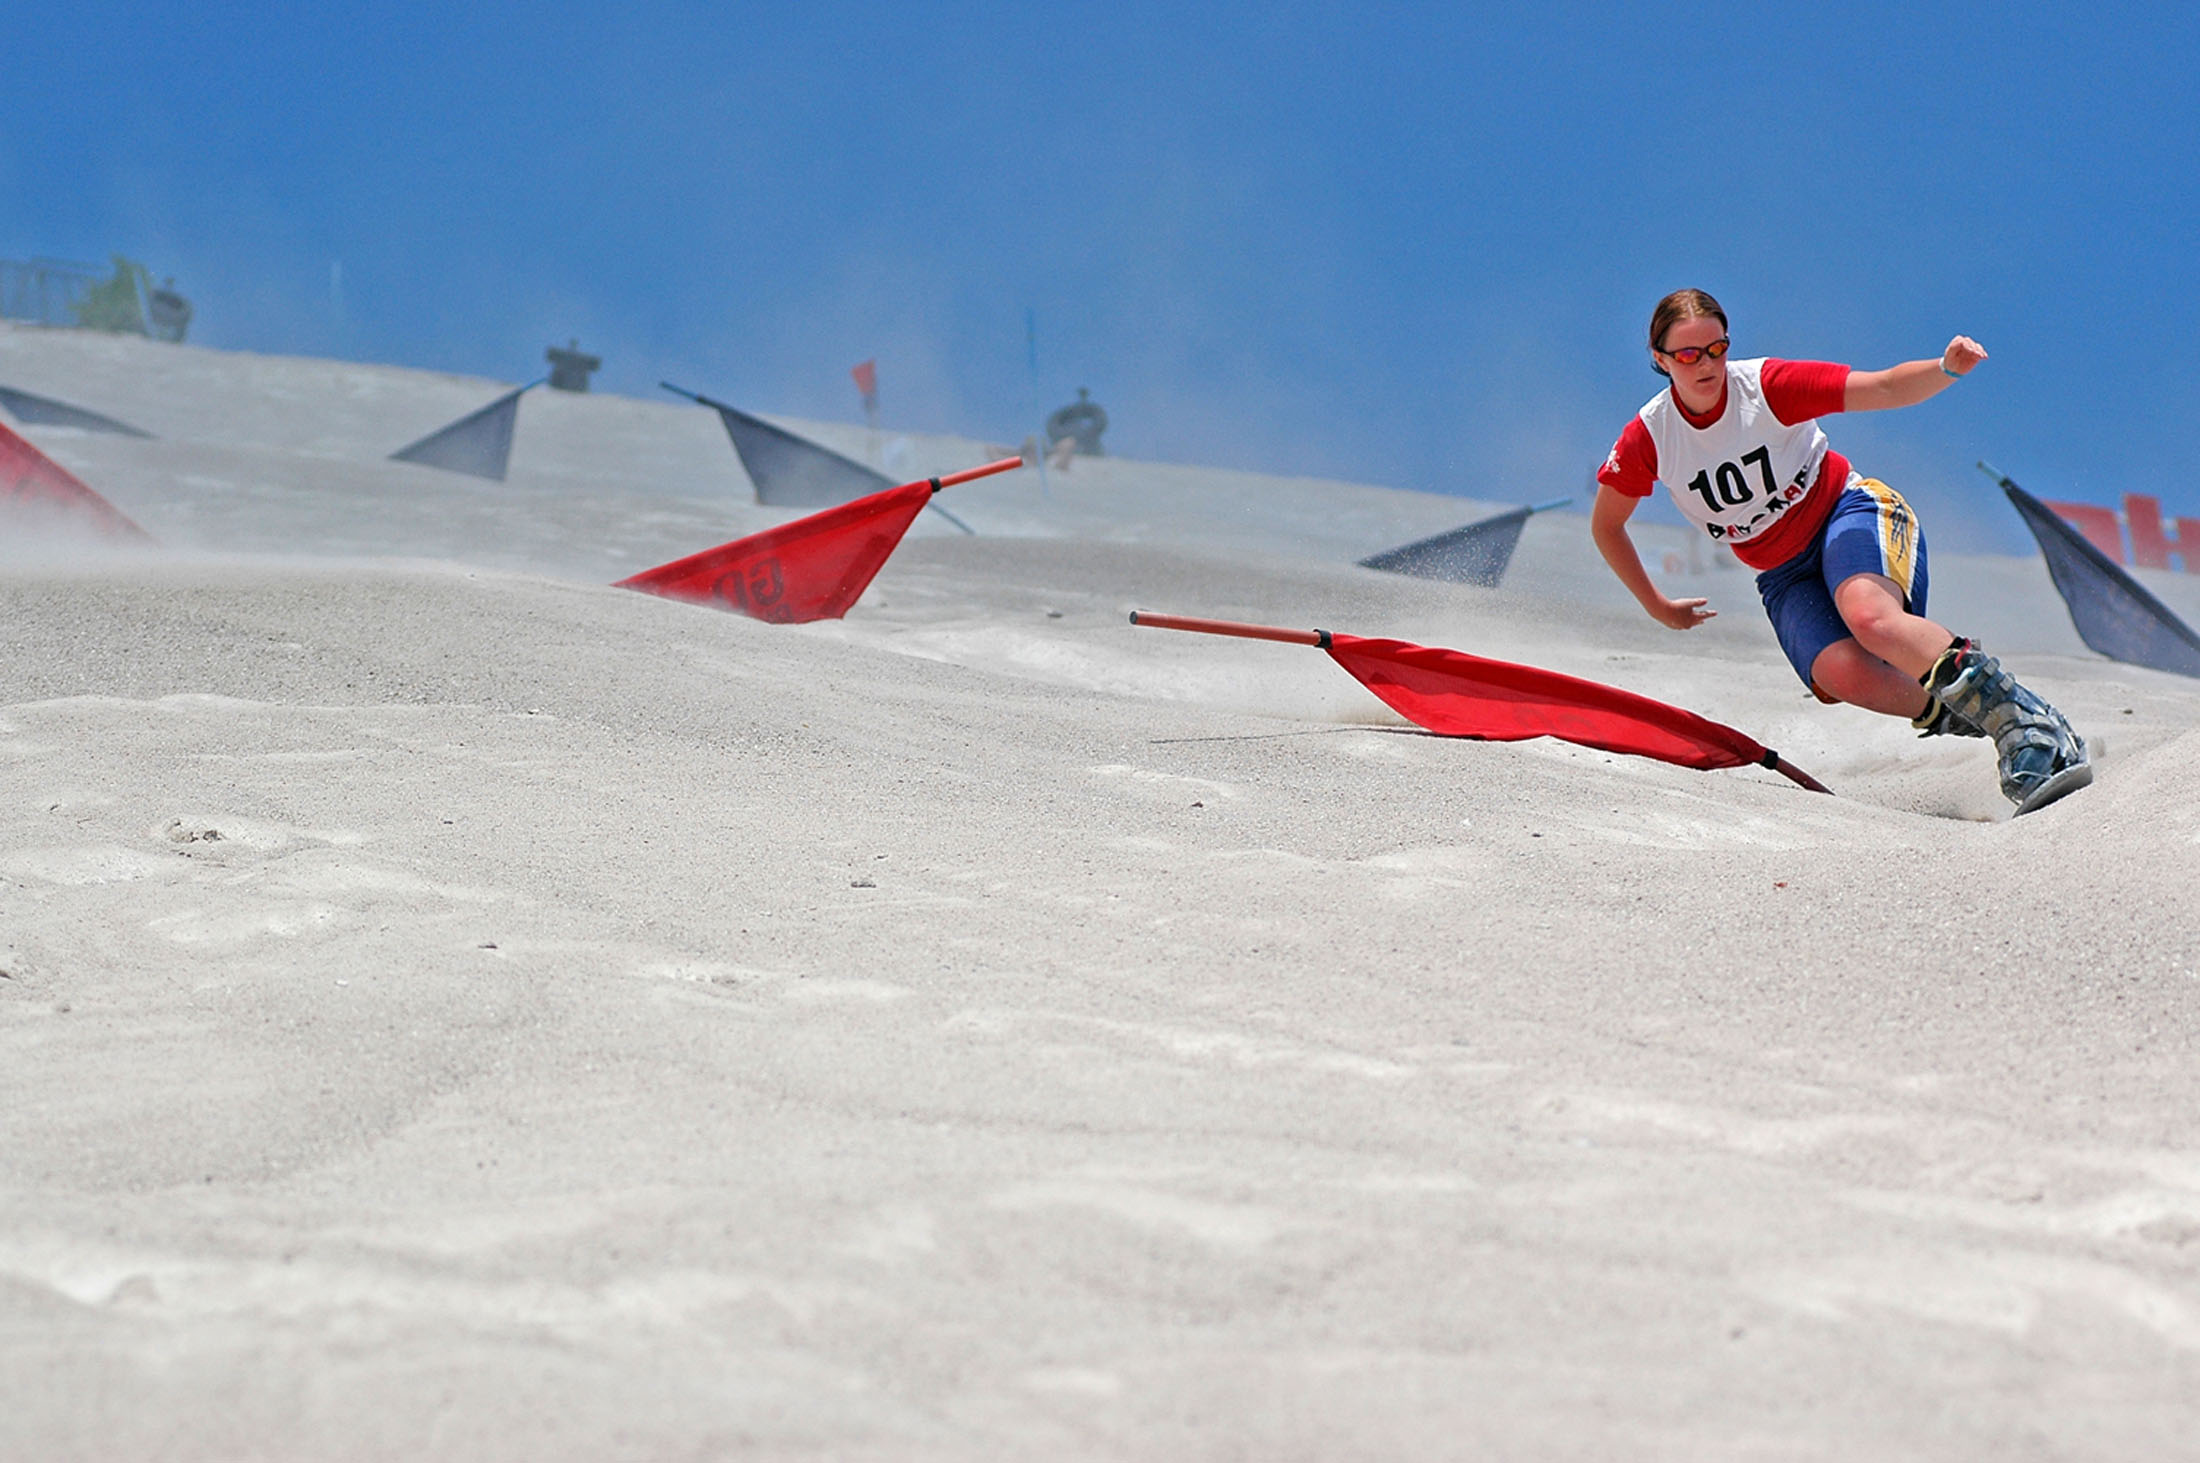 Sandboarding at Monte Kaolino - Sandboarden am Monte Kaolino